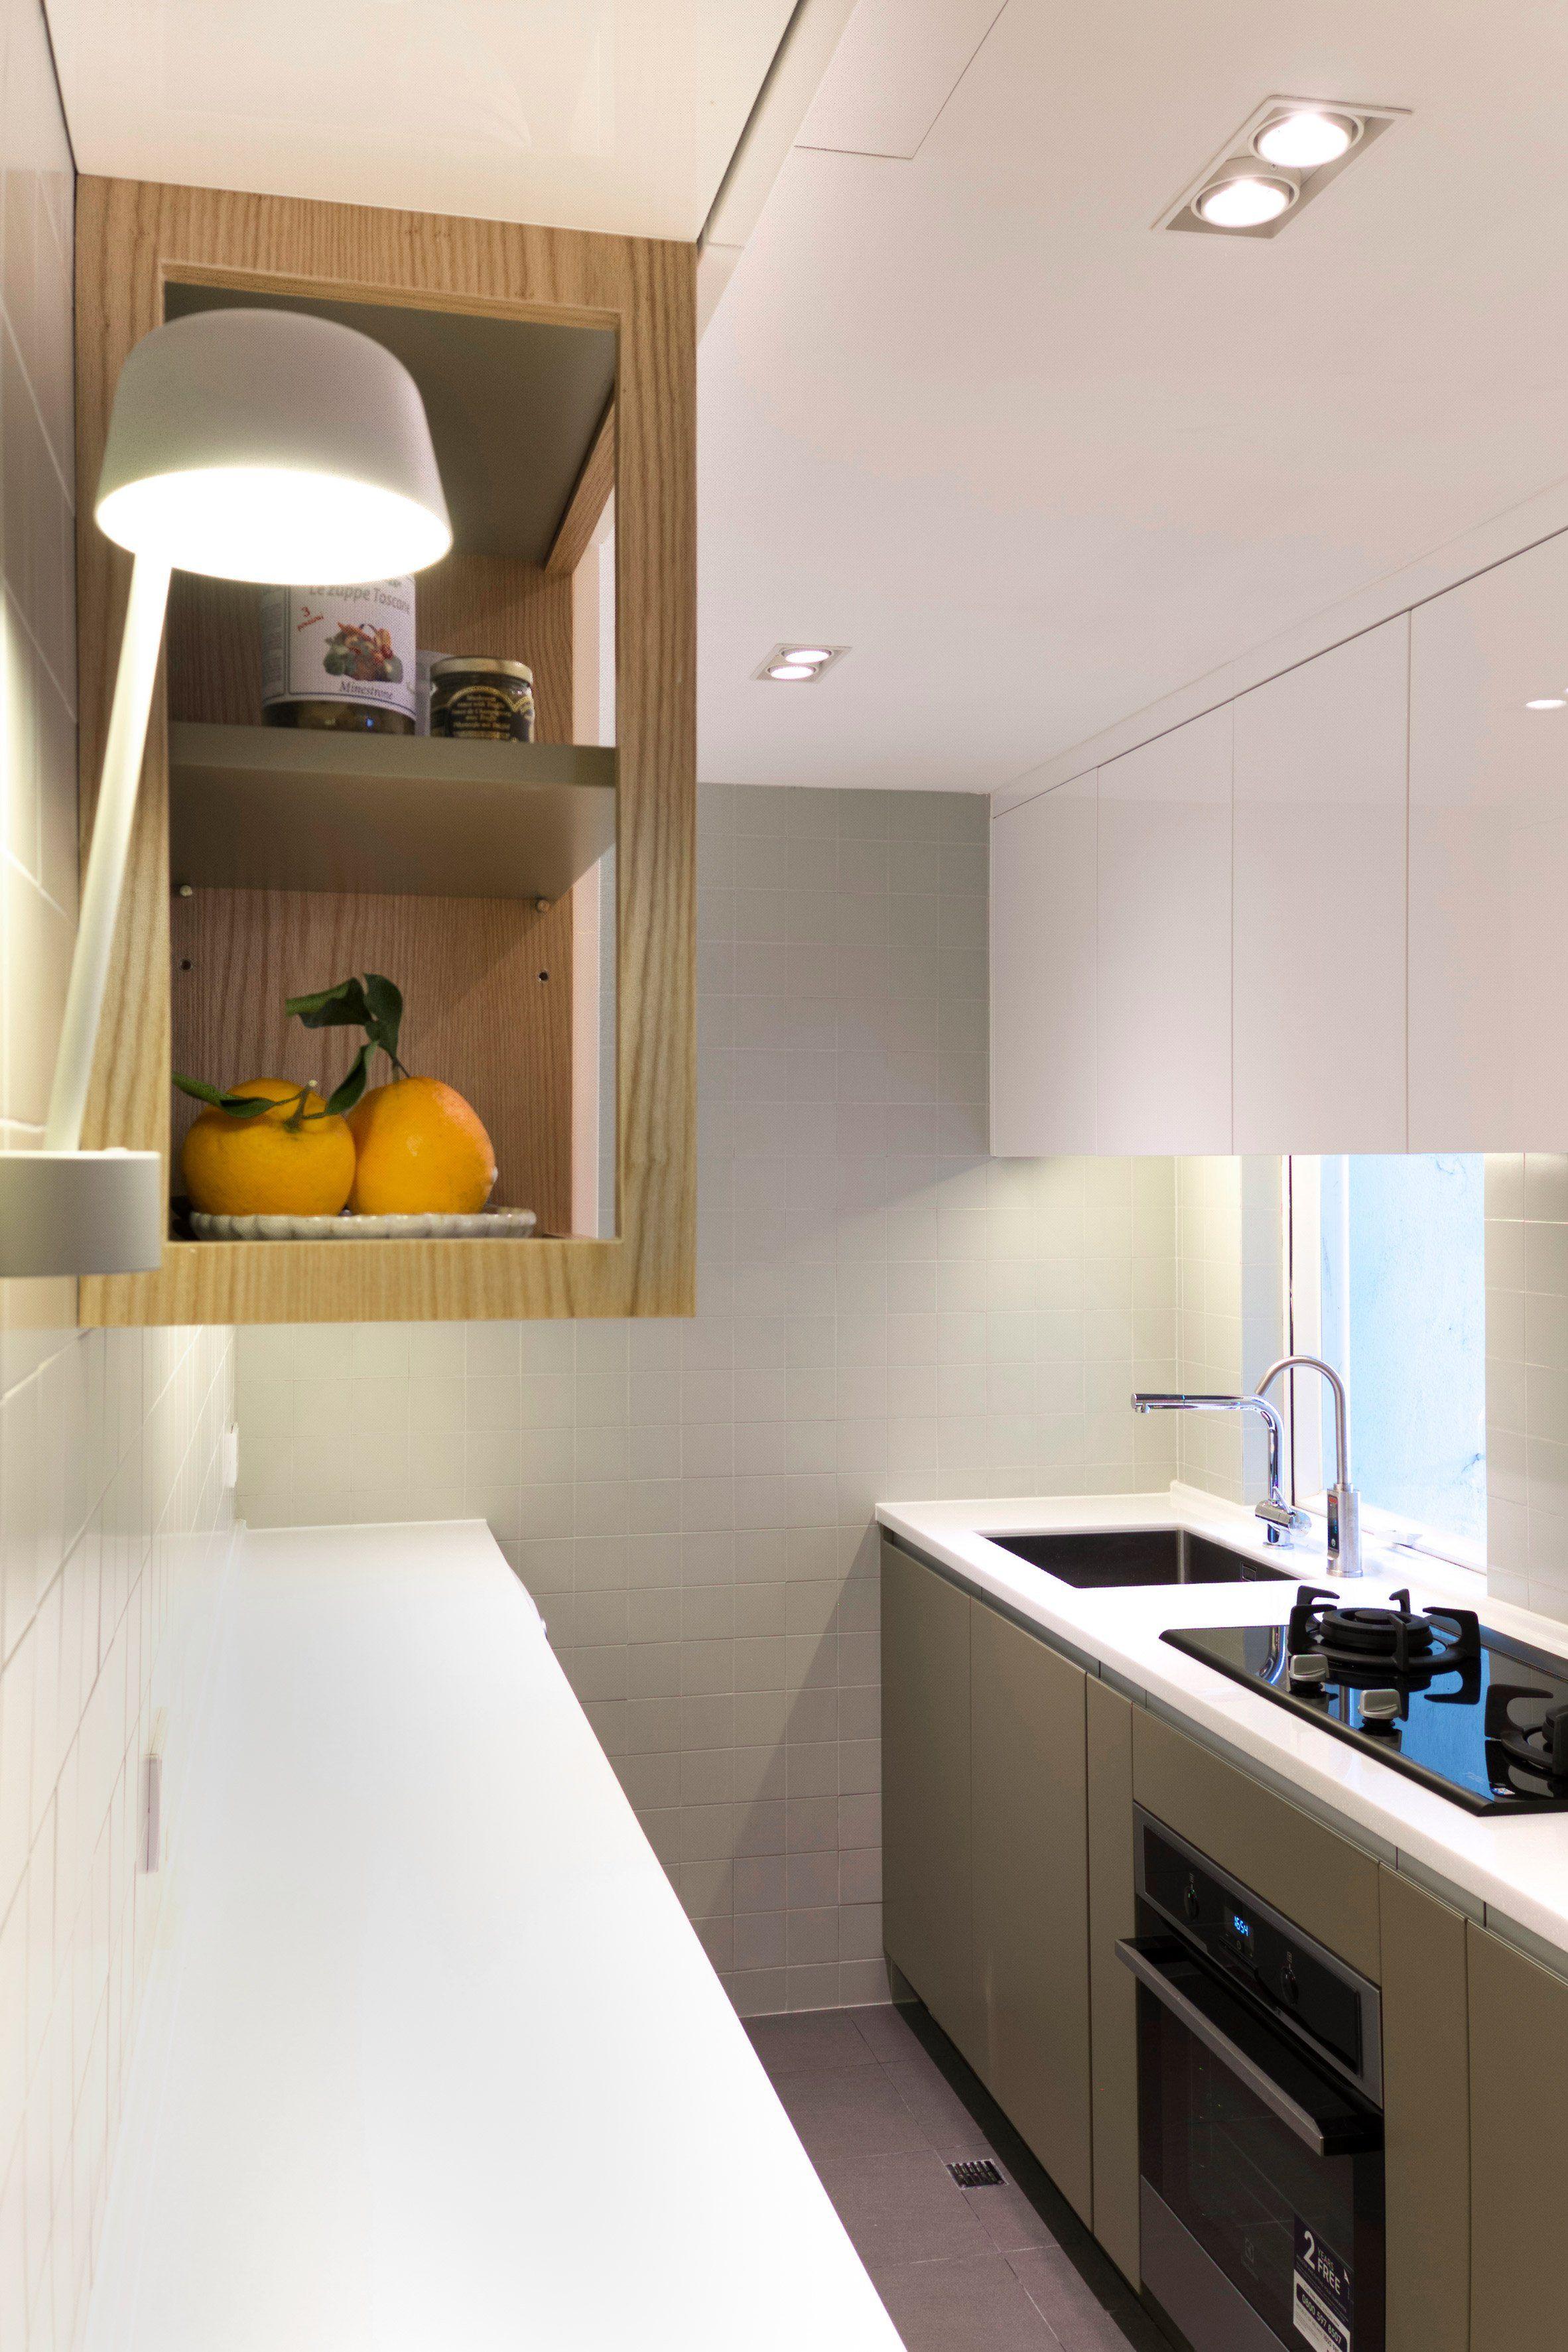 10 x 7 küchendesign flat a by design eight five two deft hong kong  apartment